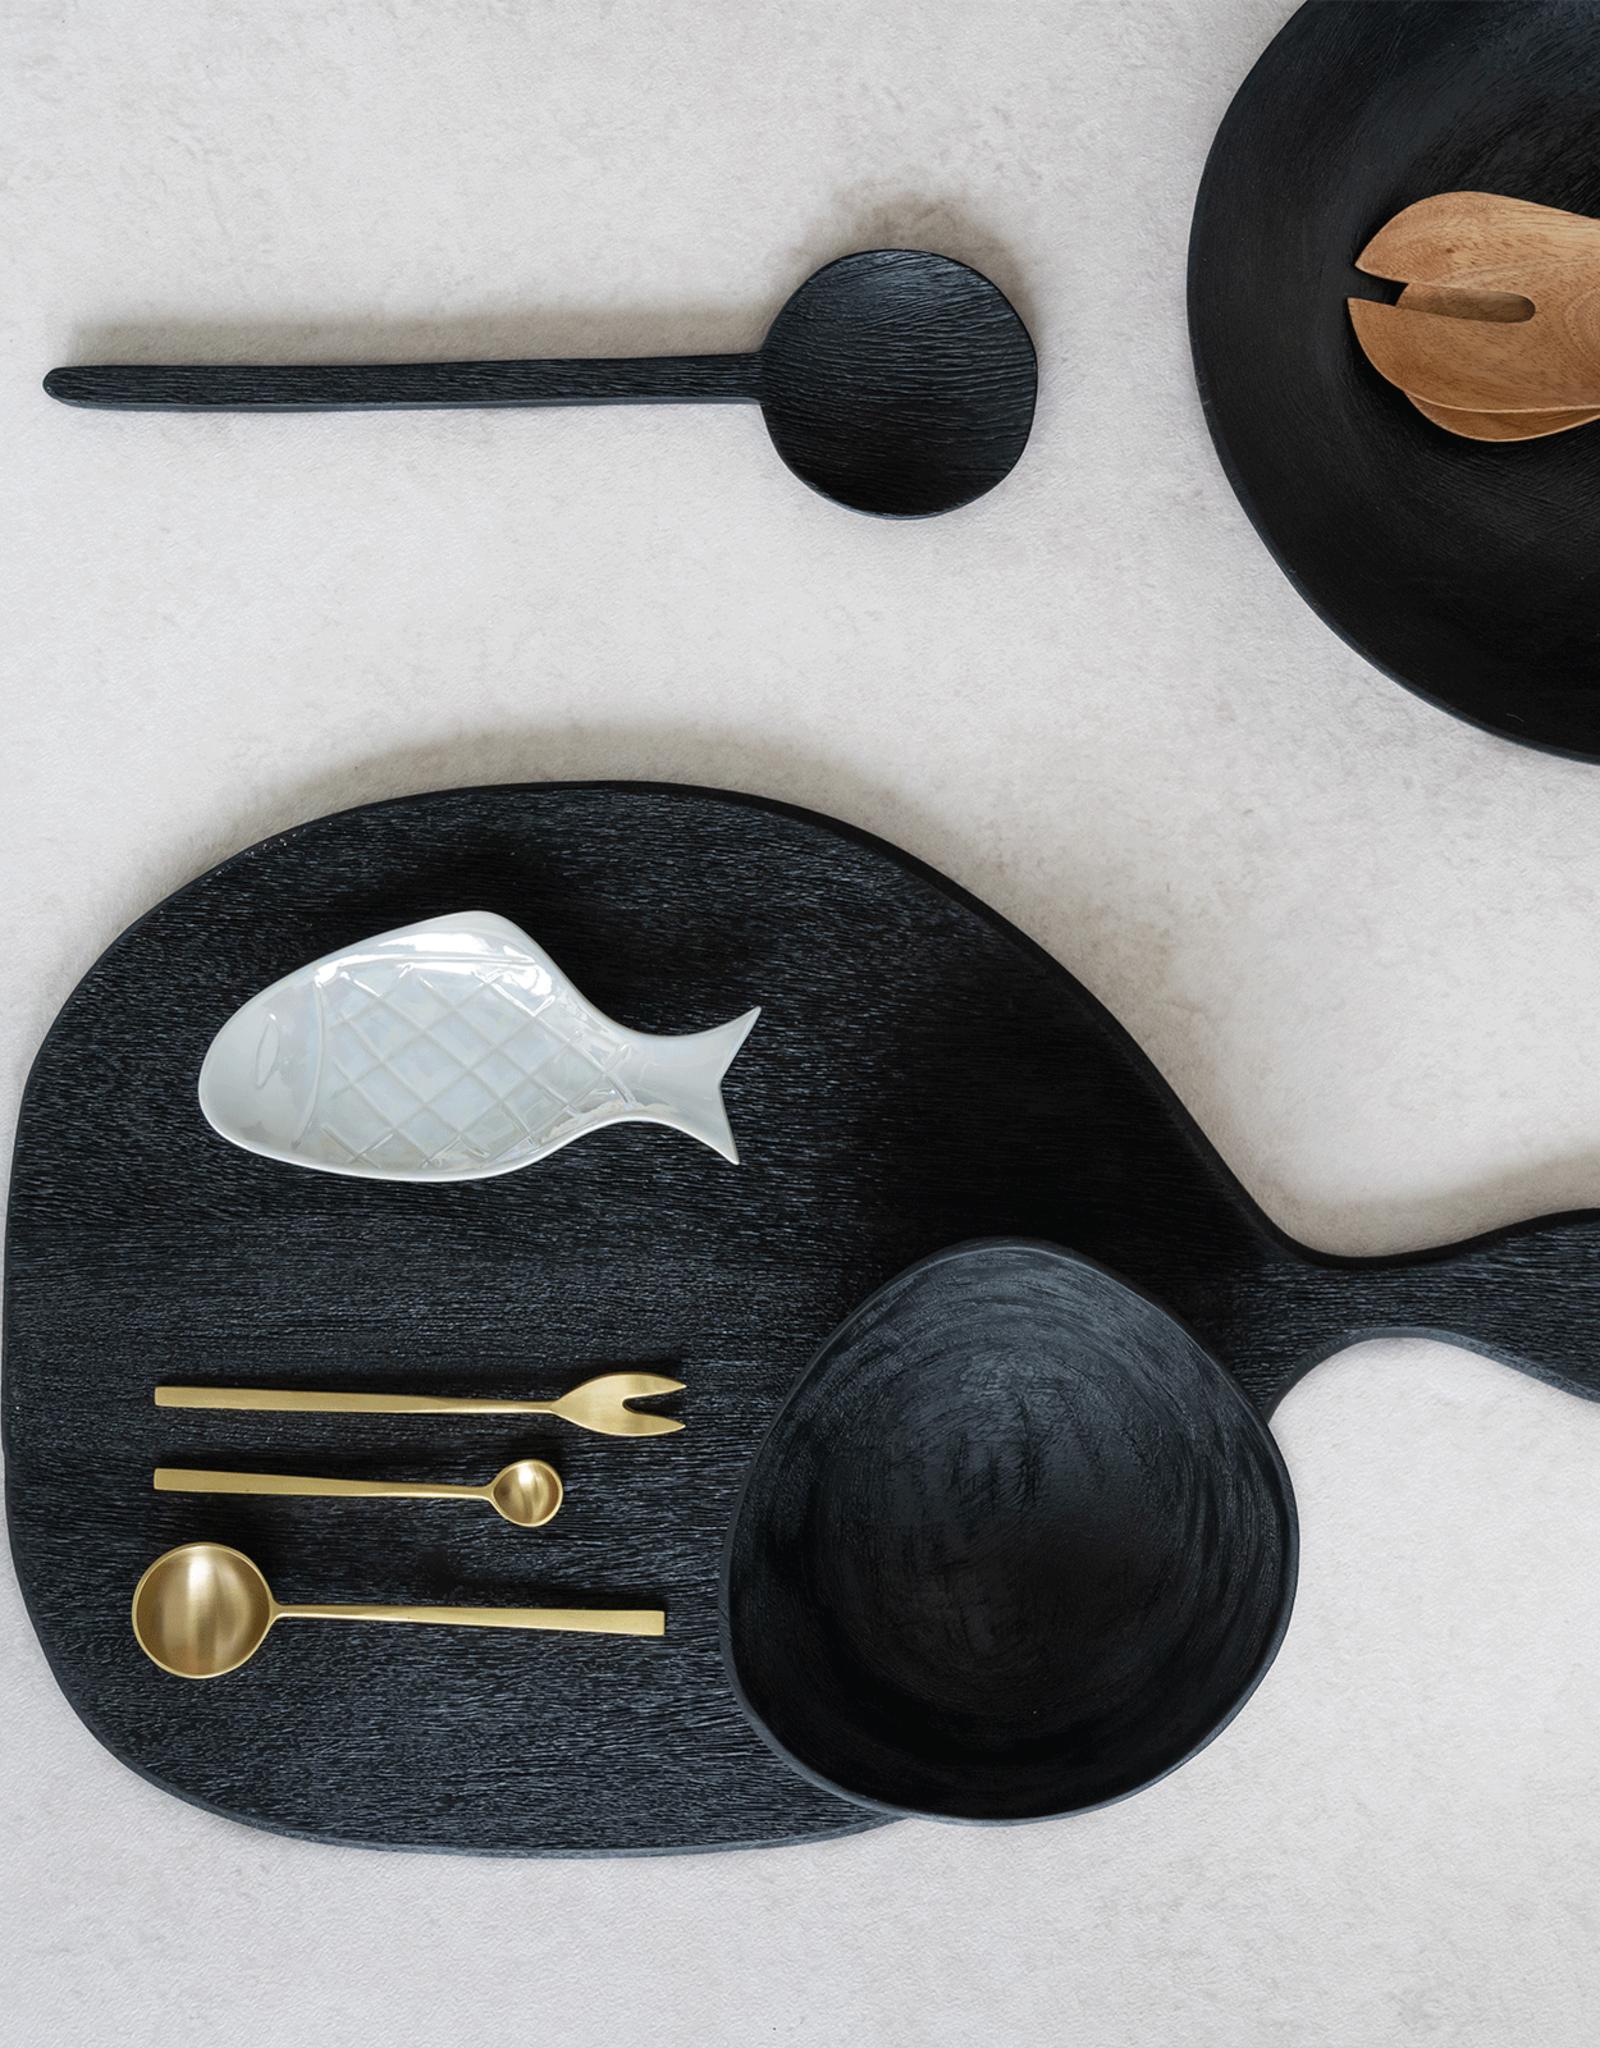 Urban Nature Culture Koffielepeltje 'Spoon' - Brass